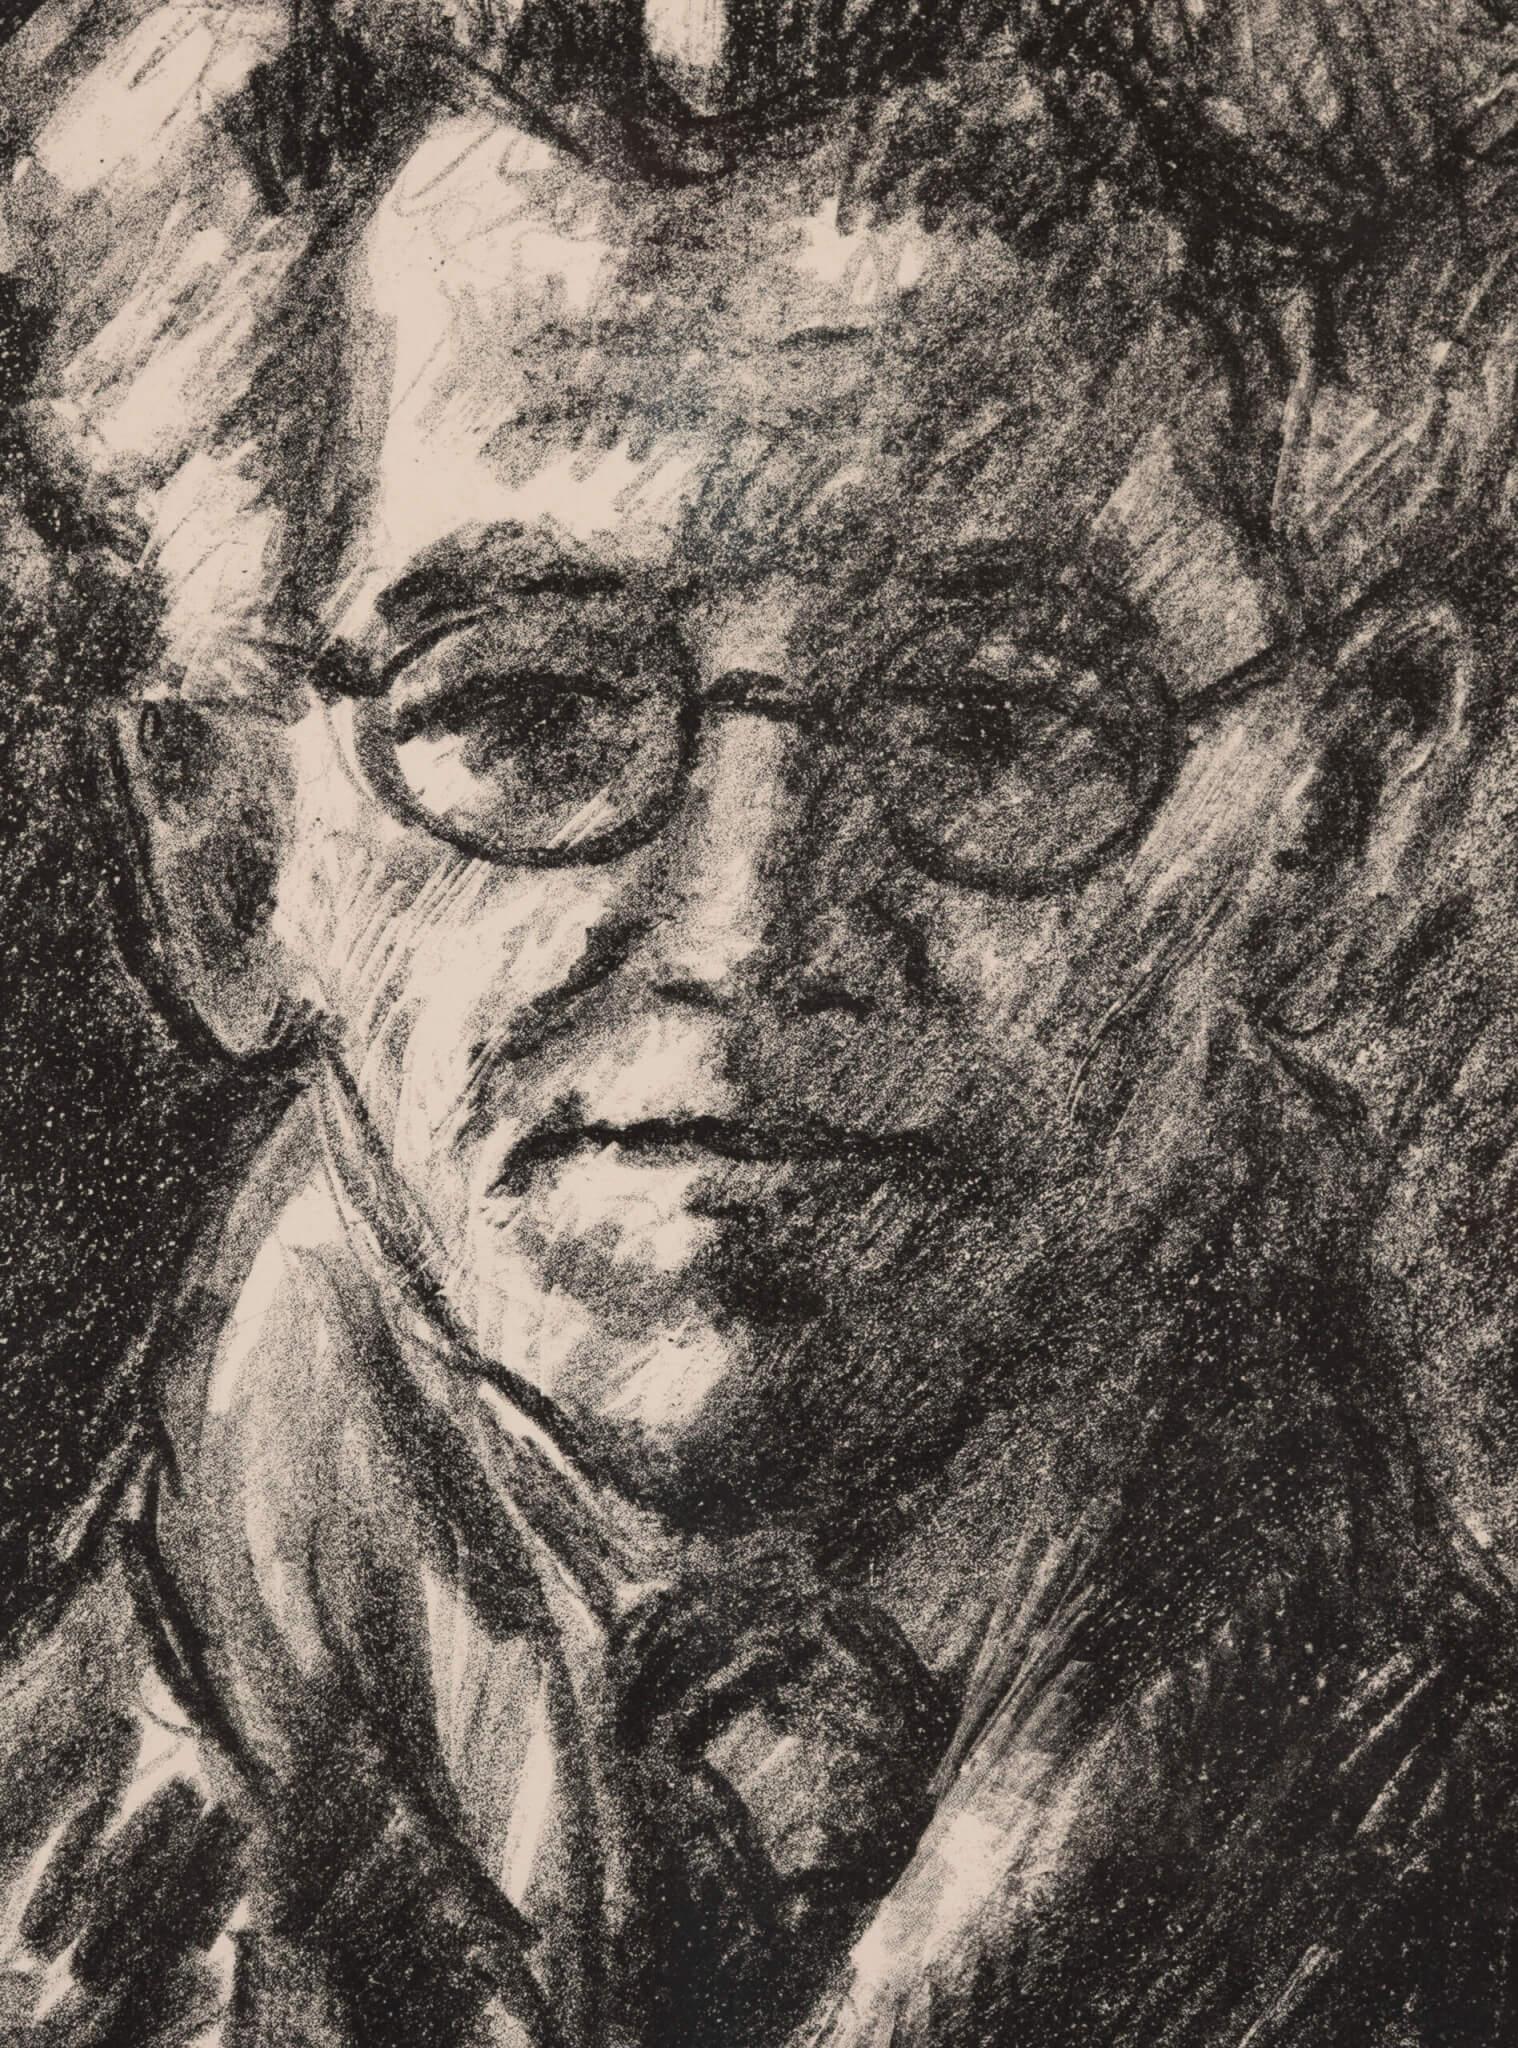 Reinholds-Kalnins-Eduard-Wiiralti-portree-Allee-galerii-oksjon